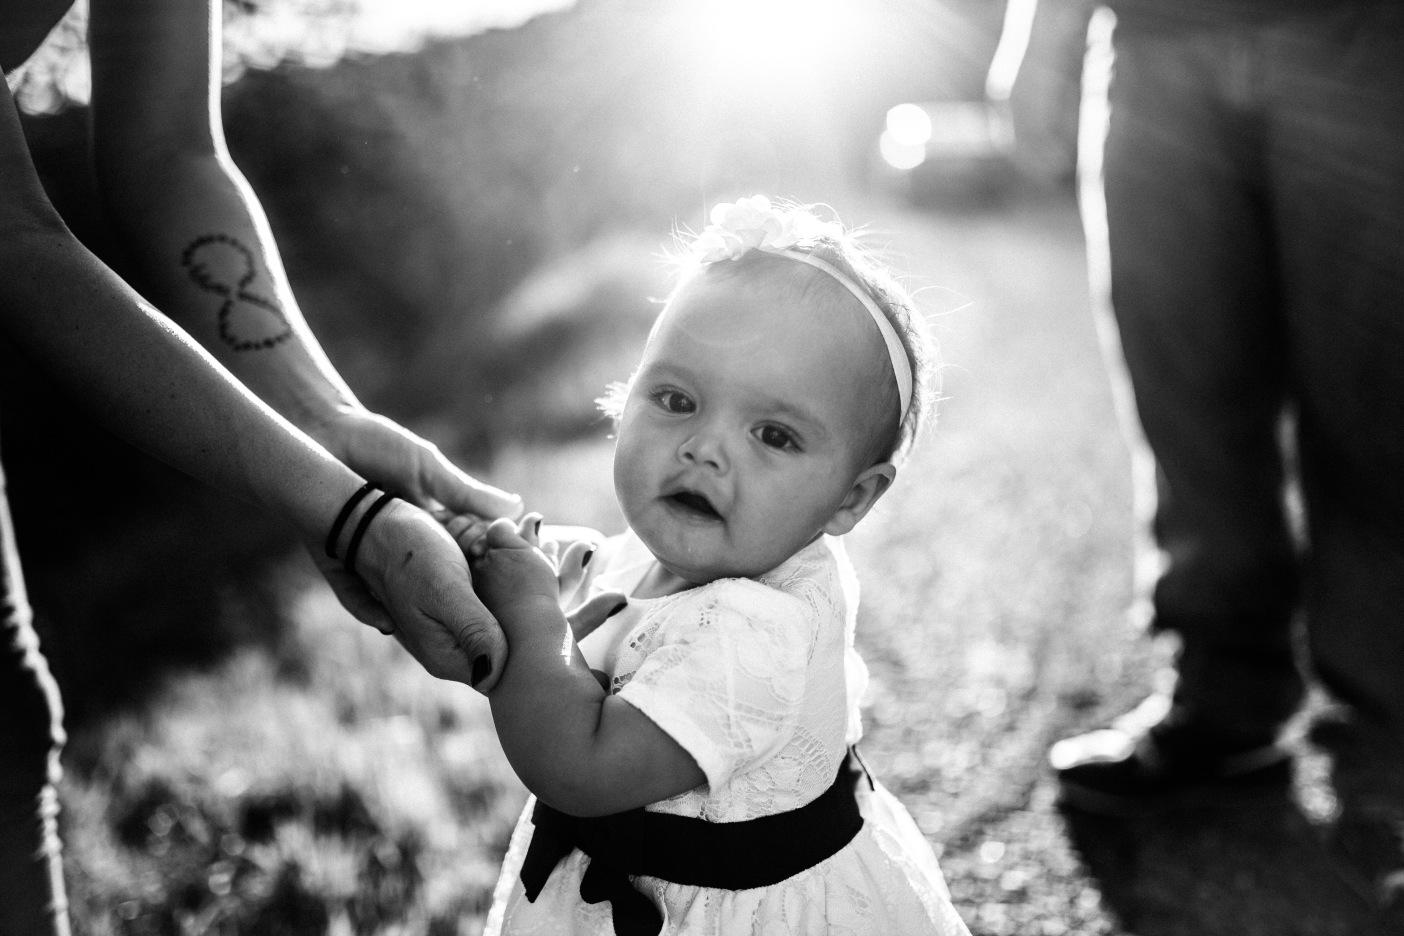 Black & White B&W Sun Flare Adorable Toddler Portrait Sierra Nevada Mountain Foothills